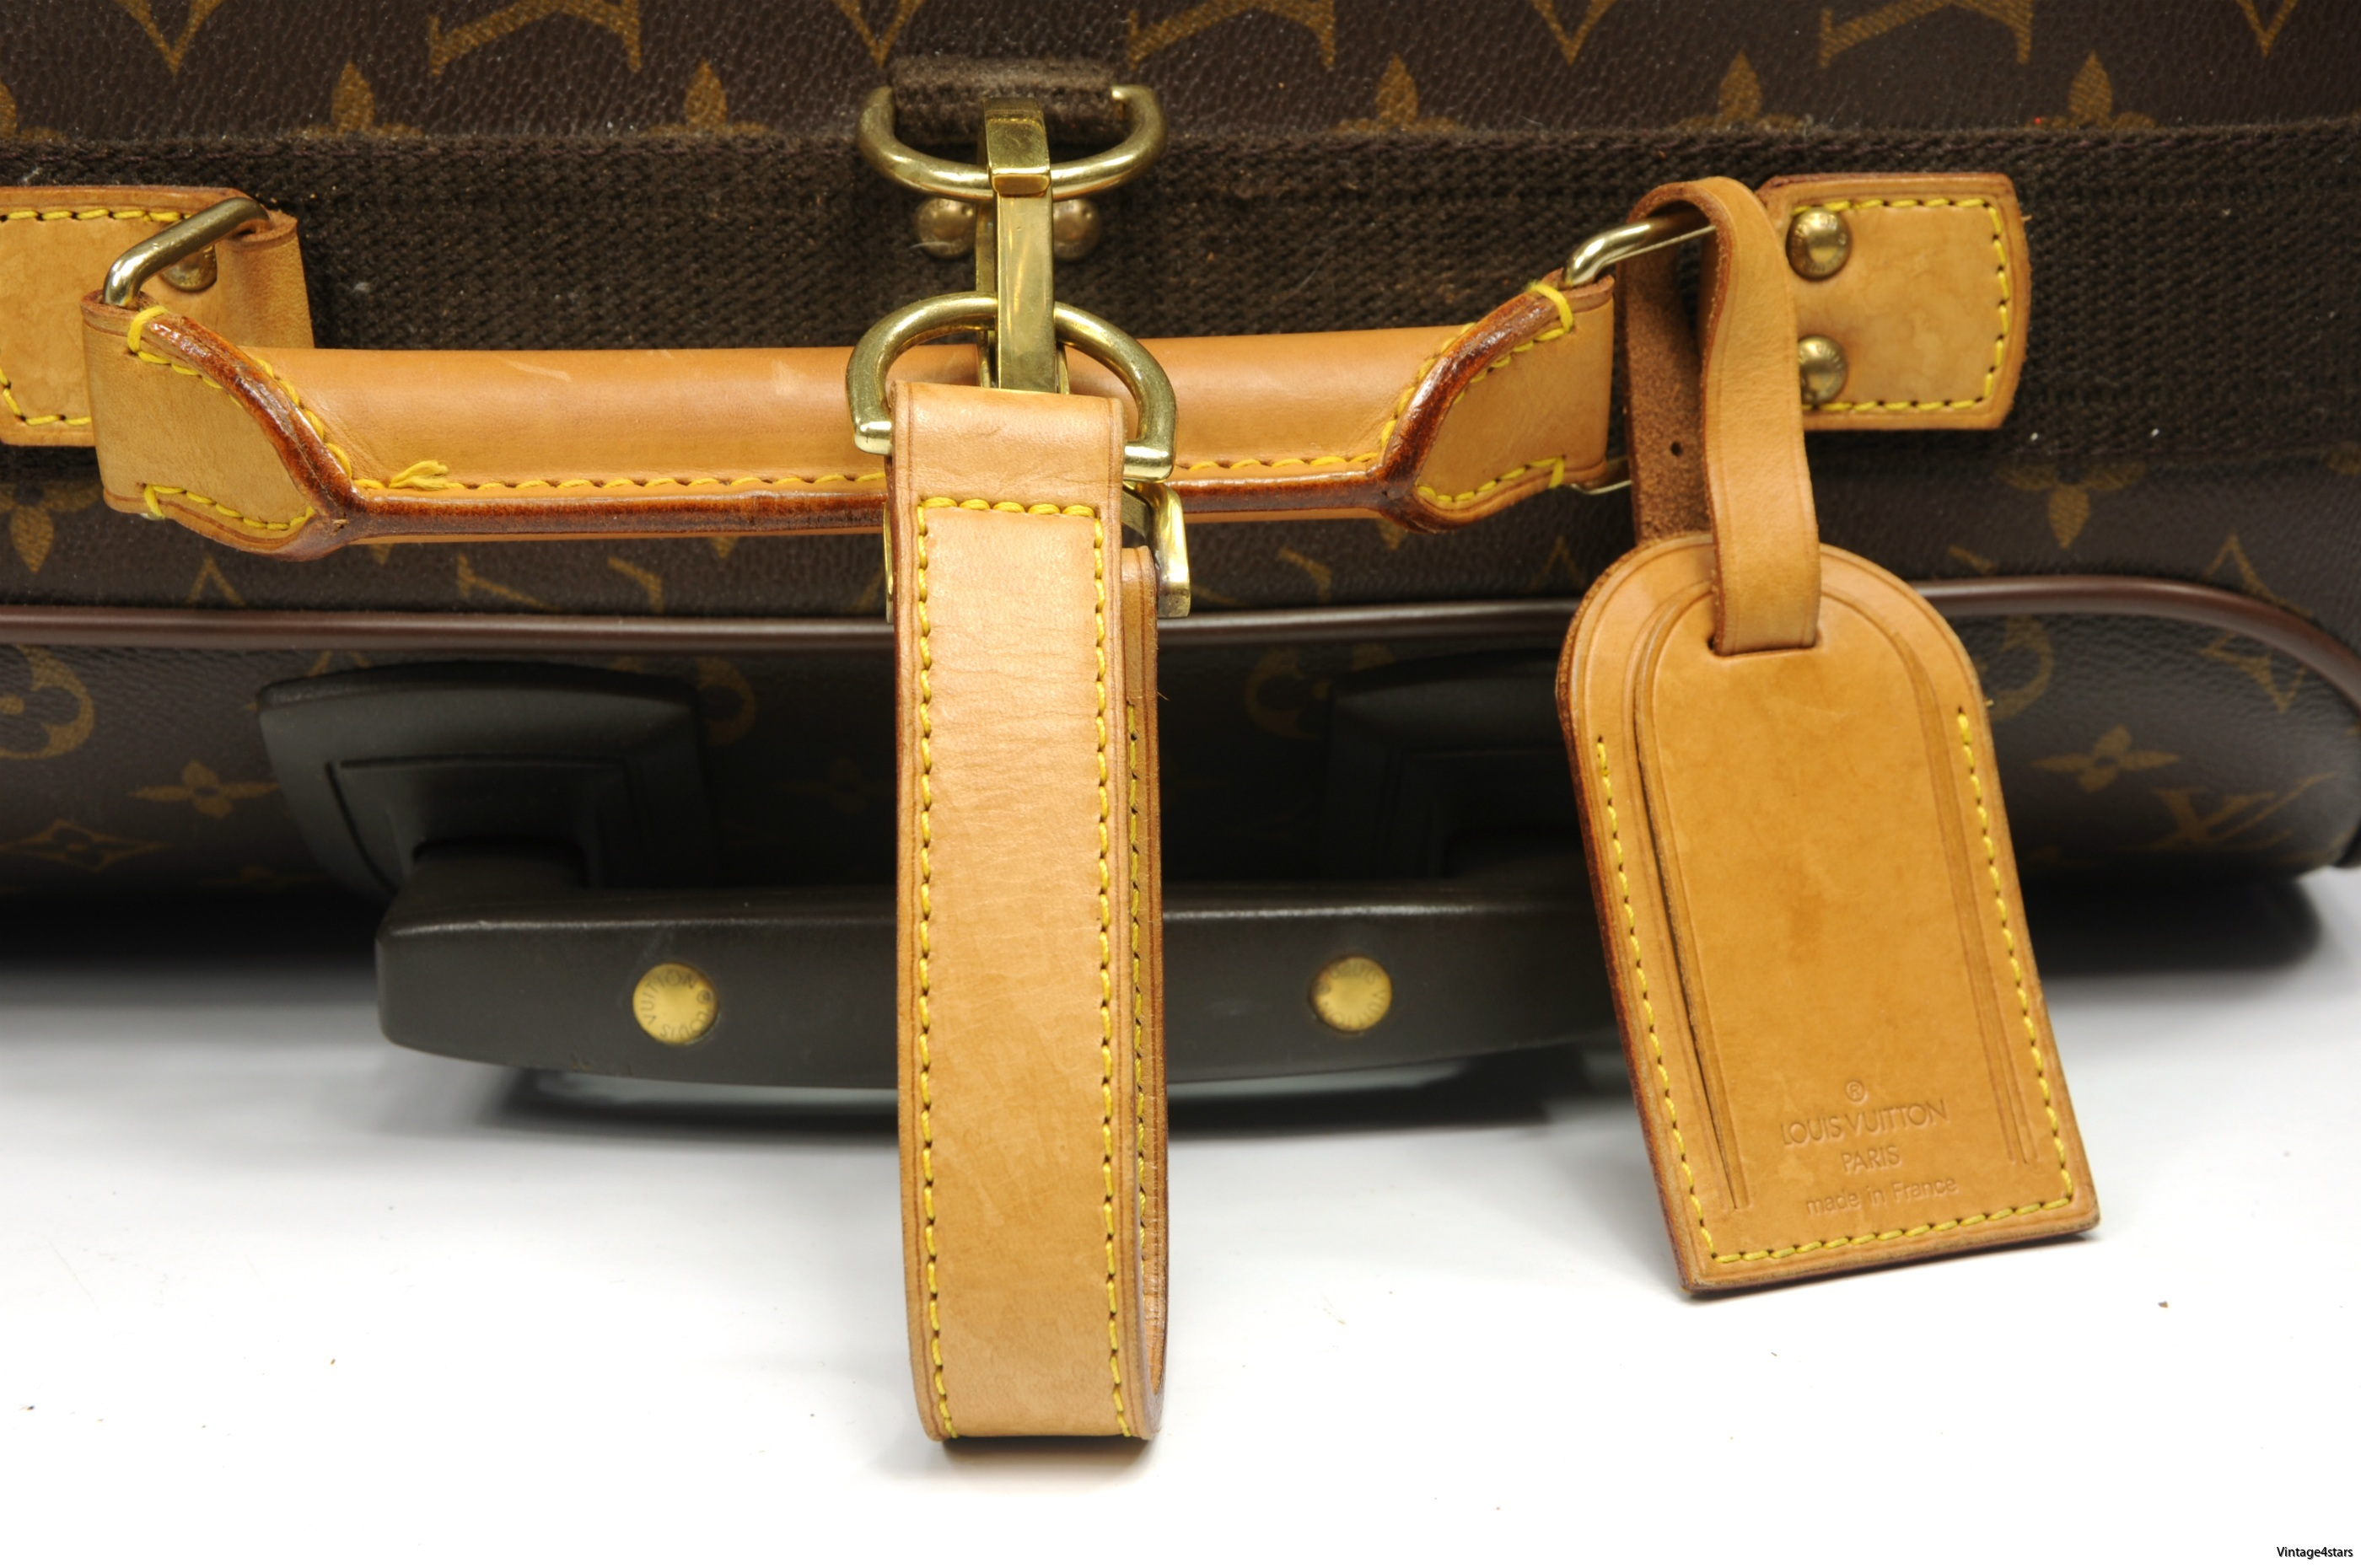 Louis Vuitton Pegase 55 Monogram 4